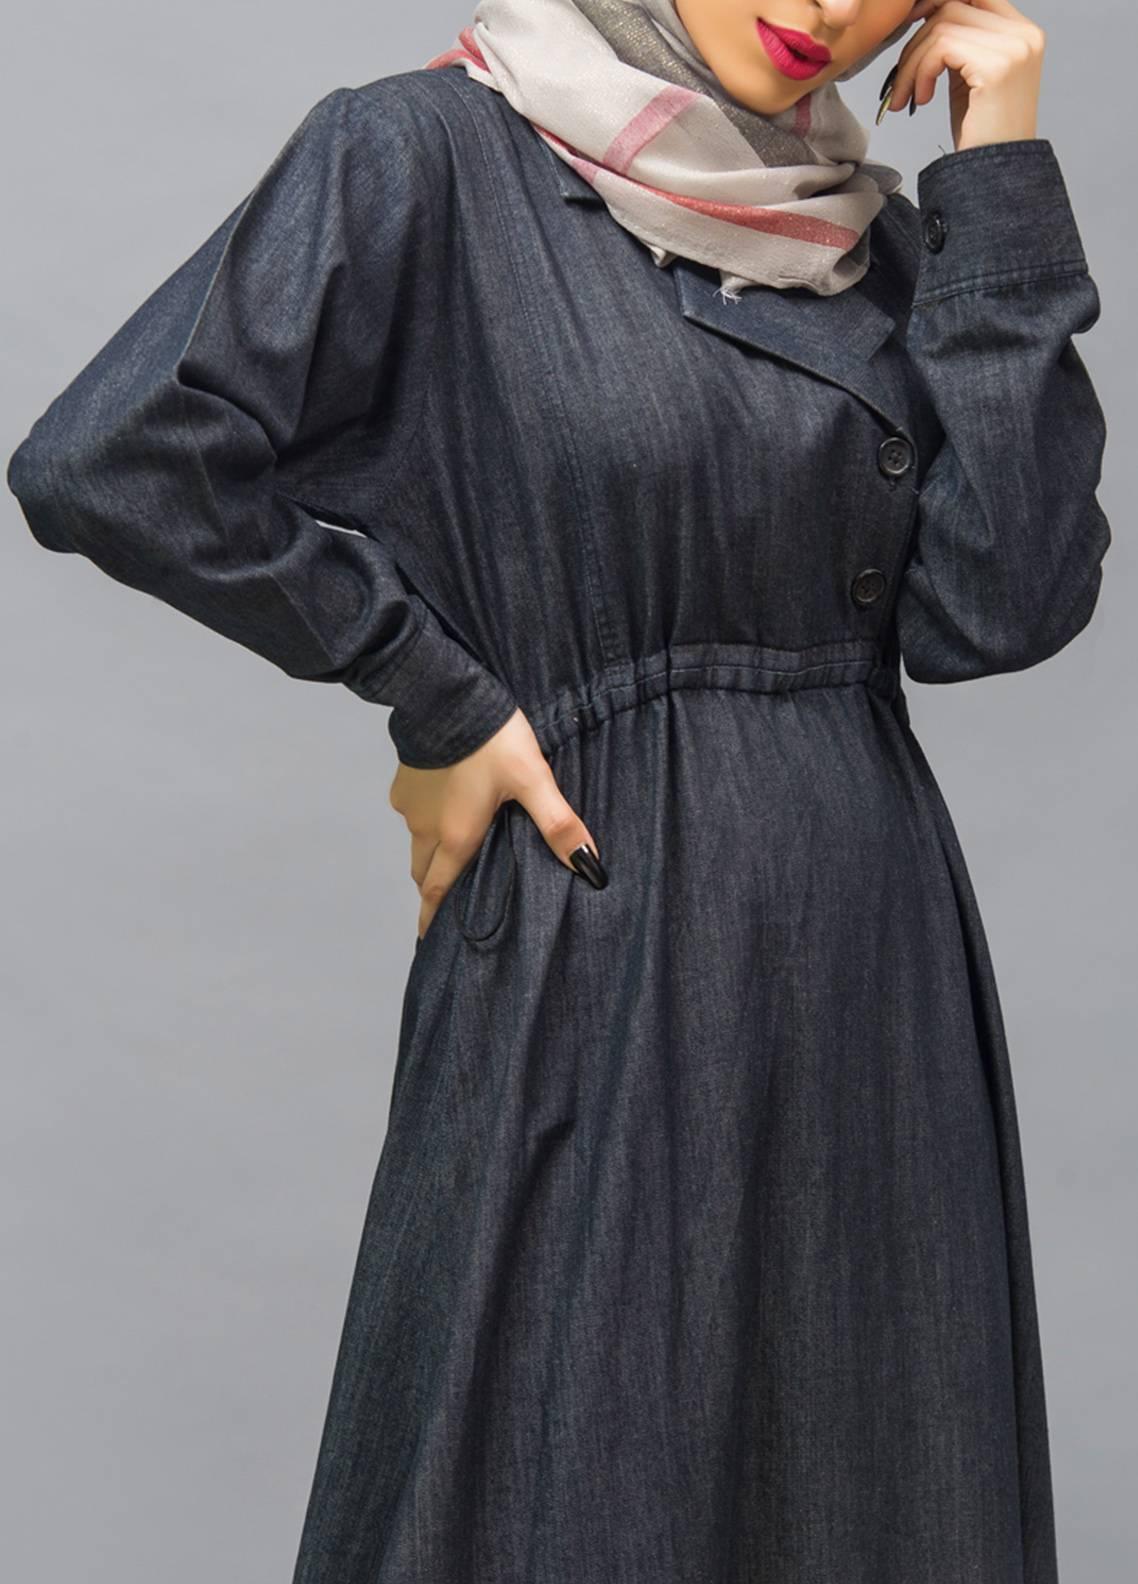 Hijab ul Hareem Front Open Style Stitched Abaya 0119-R-986